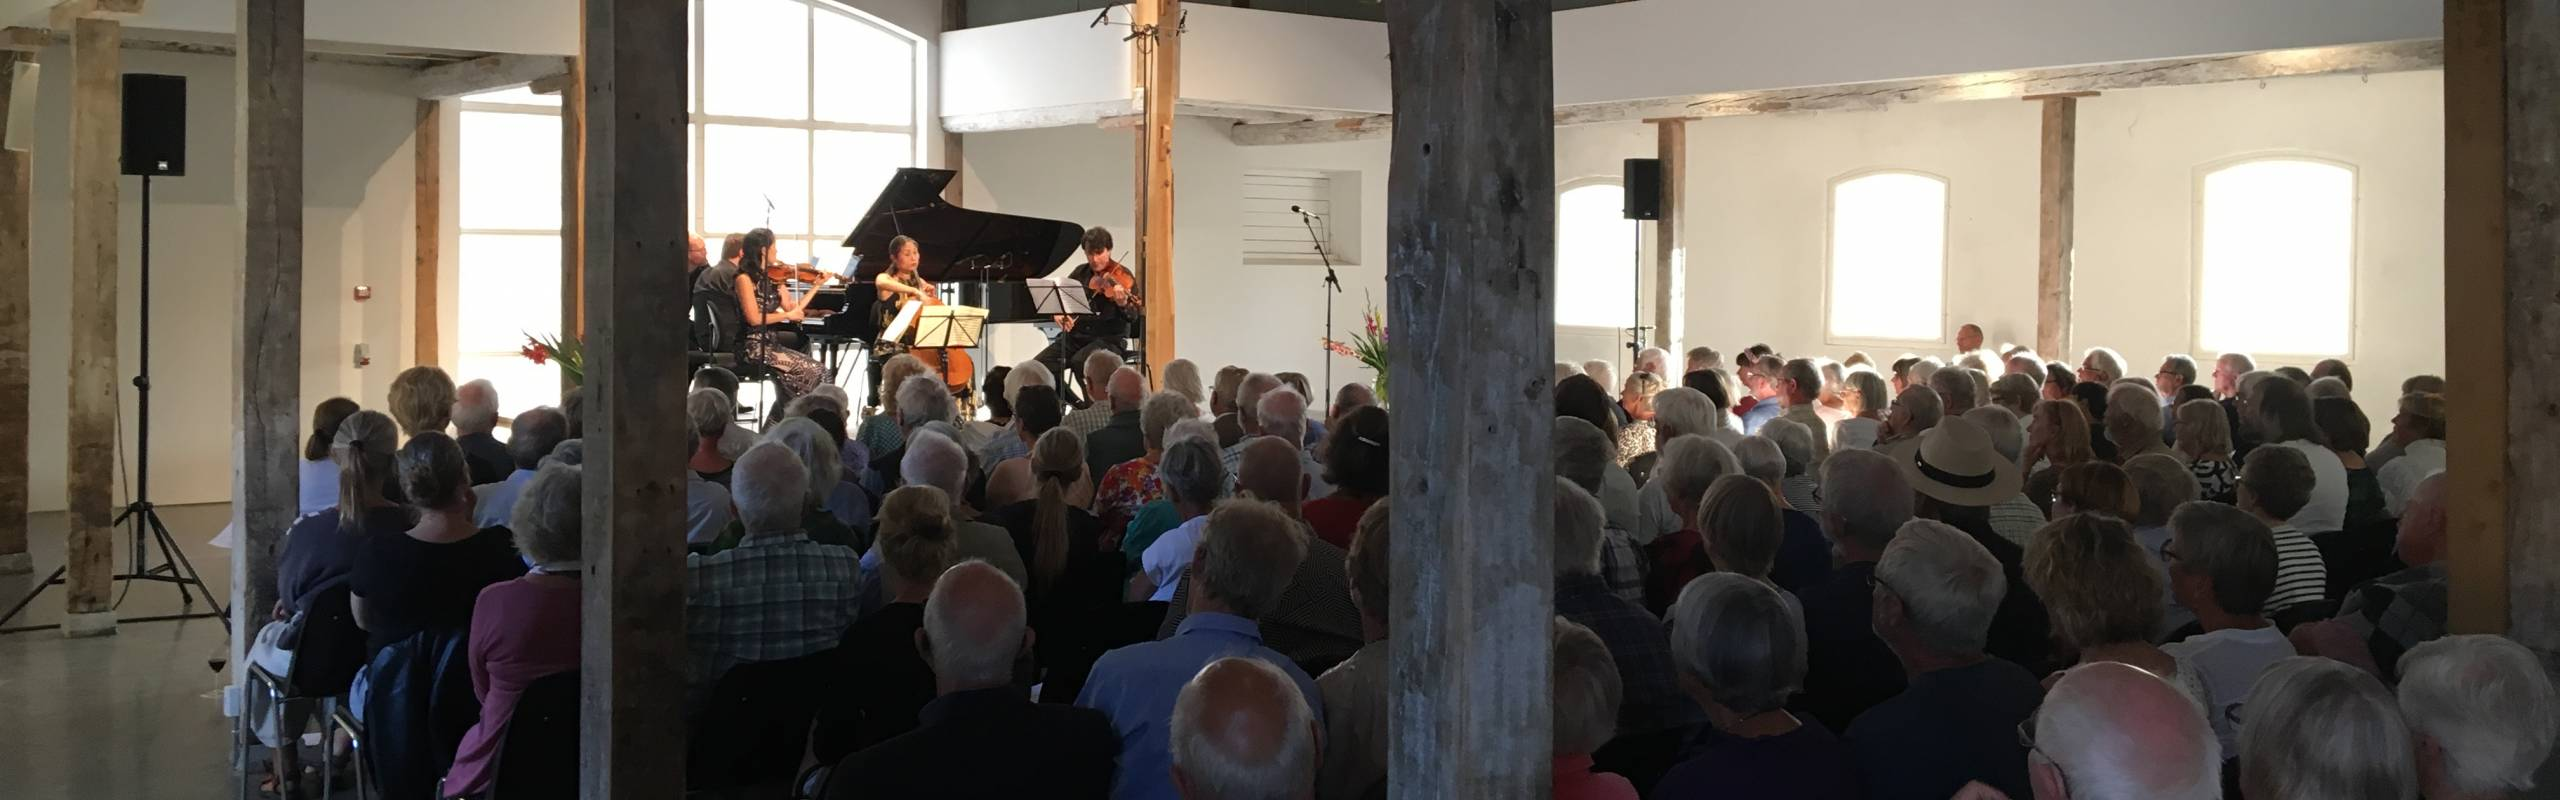 Kerteminde Kammermusikfestival